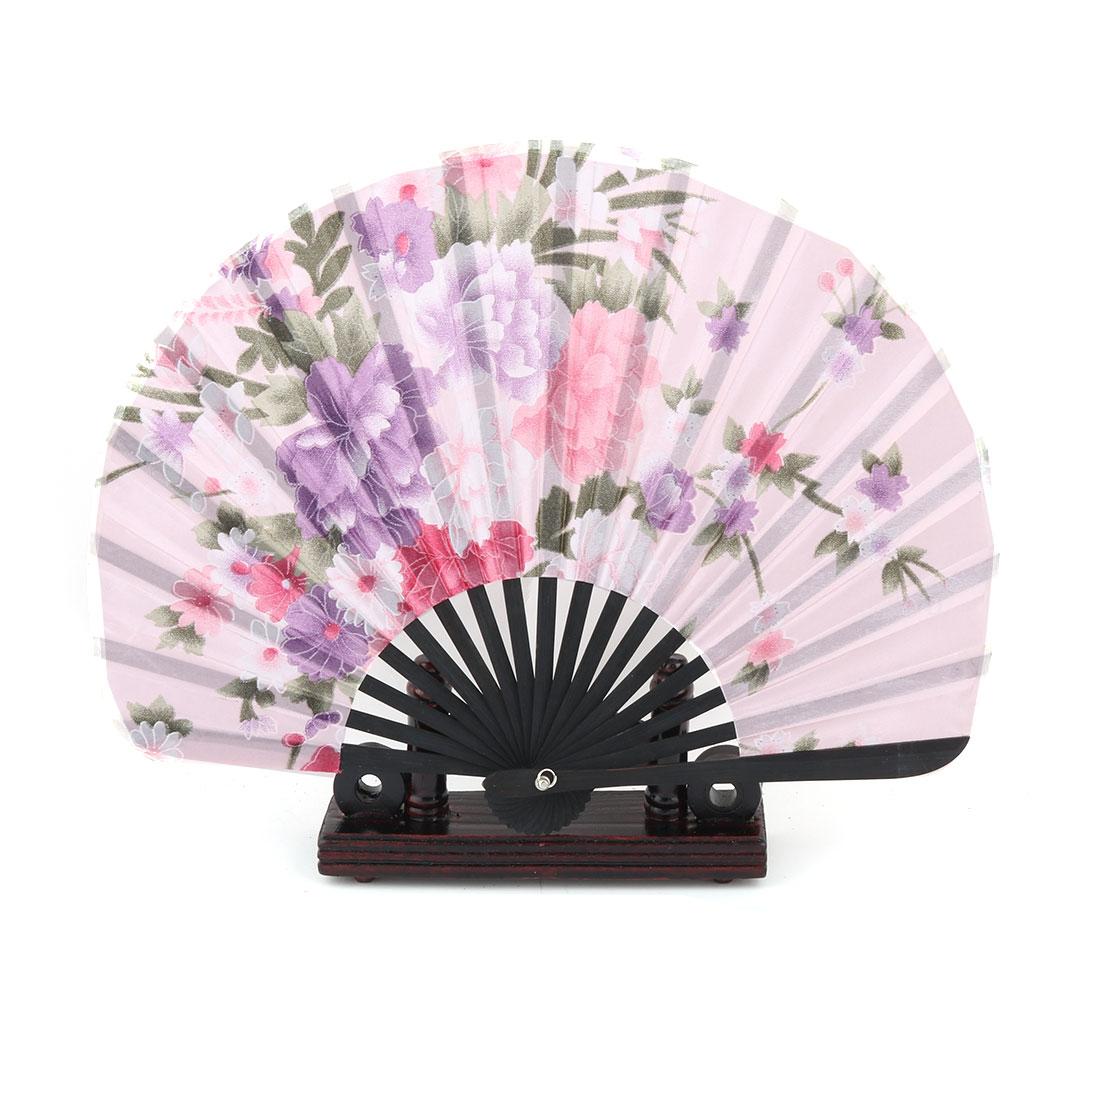 Dance Bamboo Flower Pattern Cooling Folding Hand Fan Display Light Pink 2 in 1